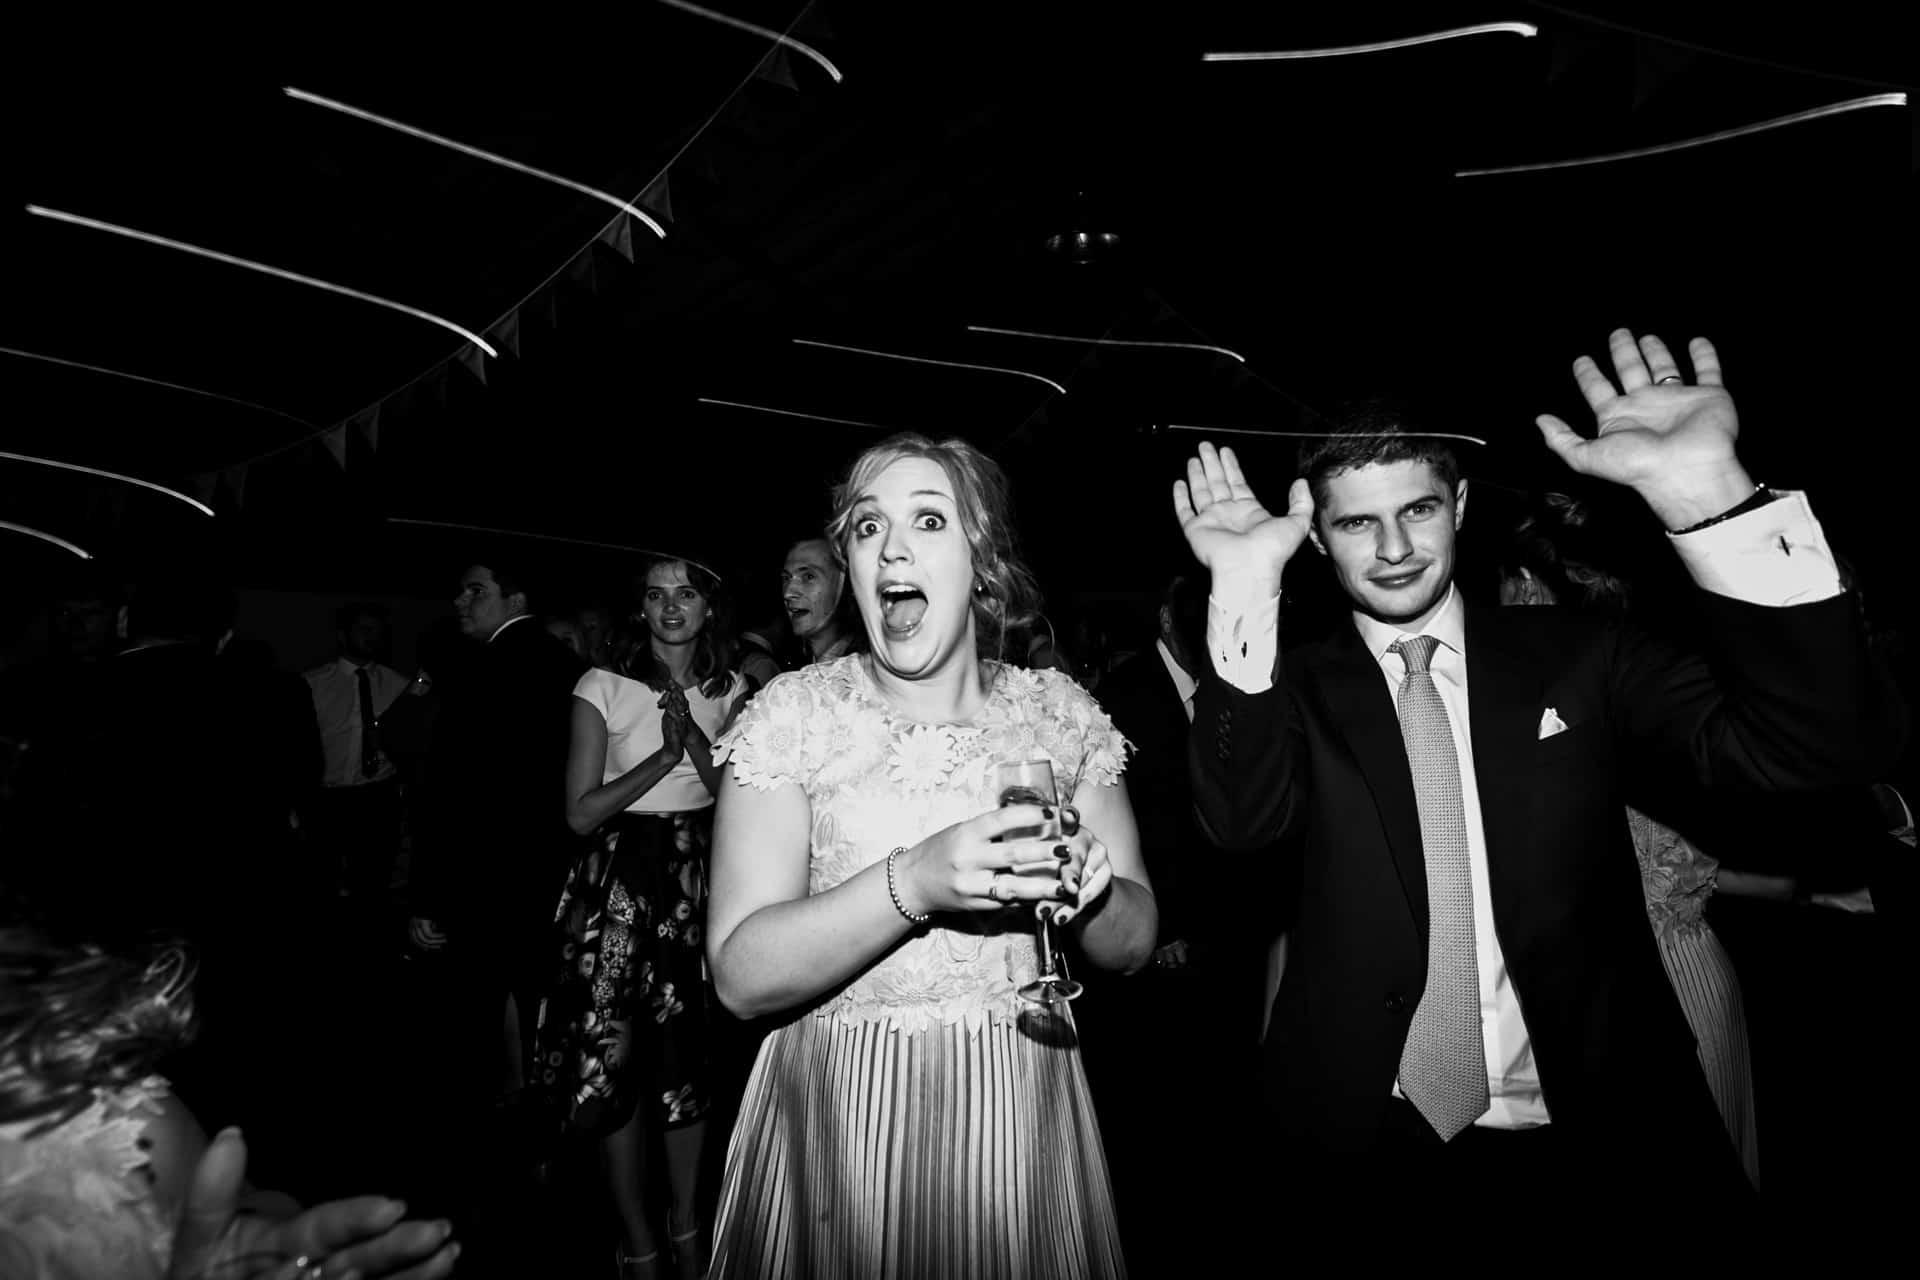 dancefloor antics at bridesmaids shot at Owen house barn wedding